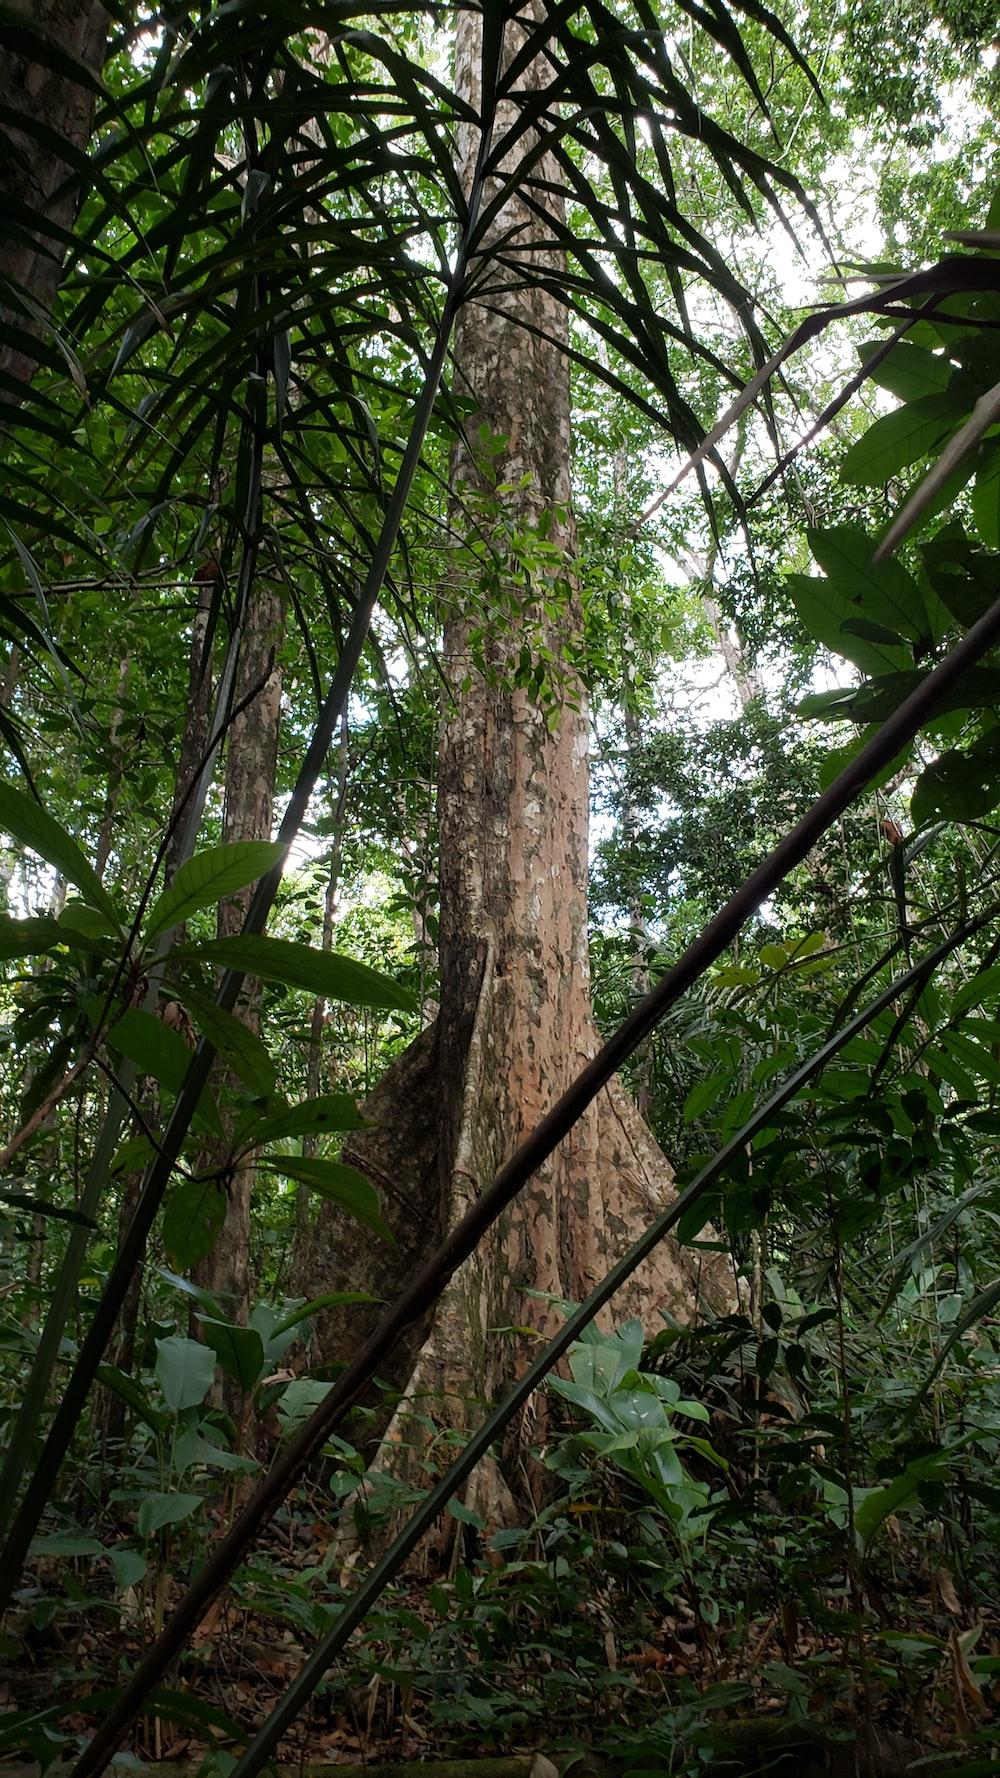 green leaves on brown tree trunk